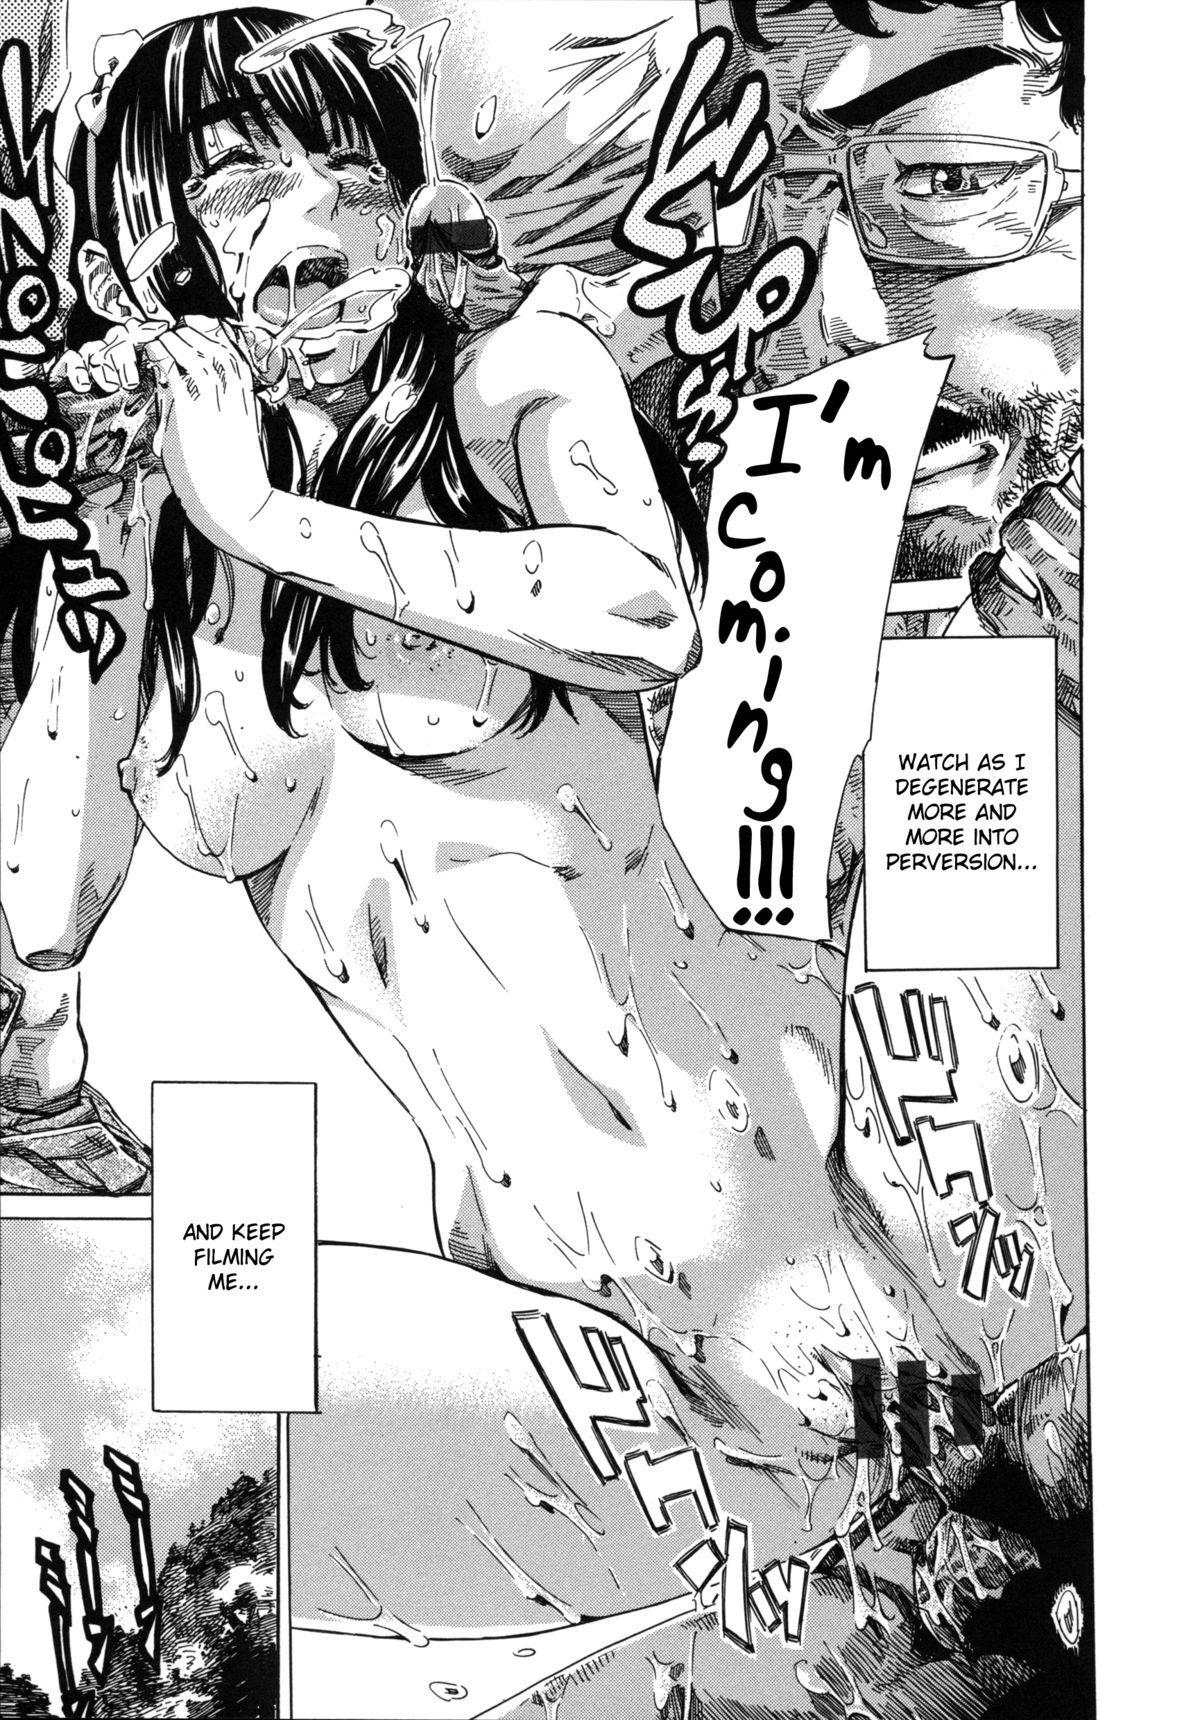 Kashiwazaki Miki wa Ironna Basho de Zenra Sanpo Shitemita | Miki Kashiwazaki Goes Naked in All Sorts of Places 189